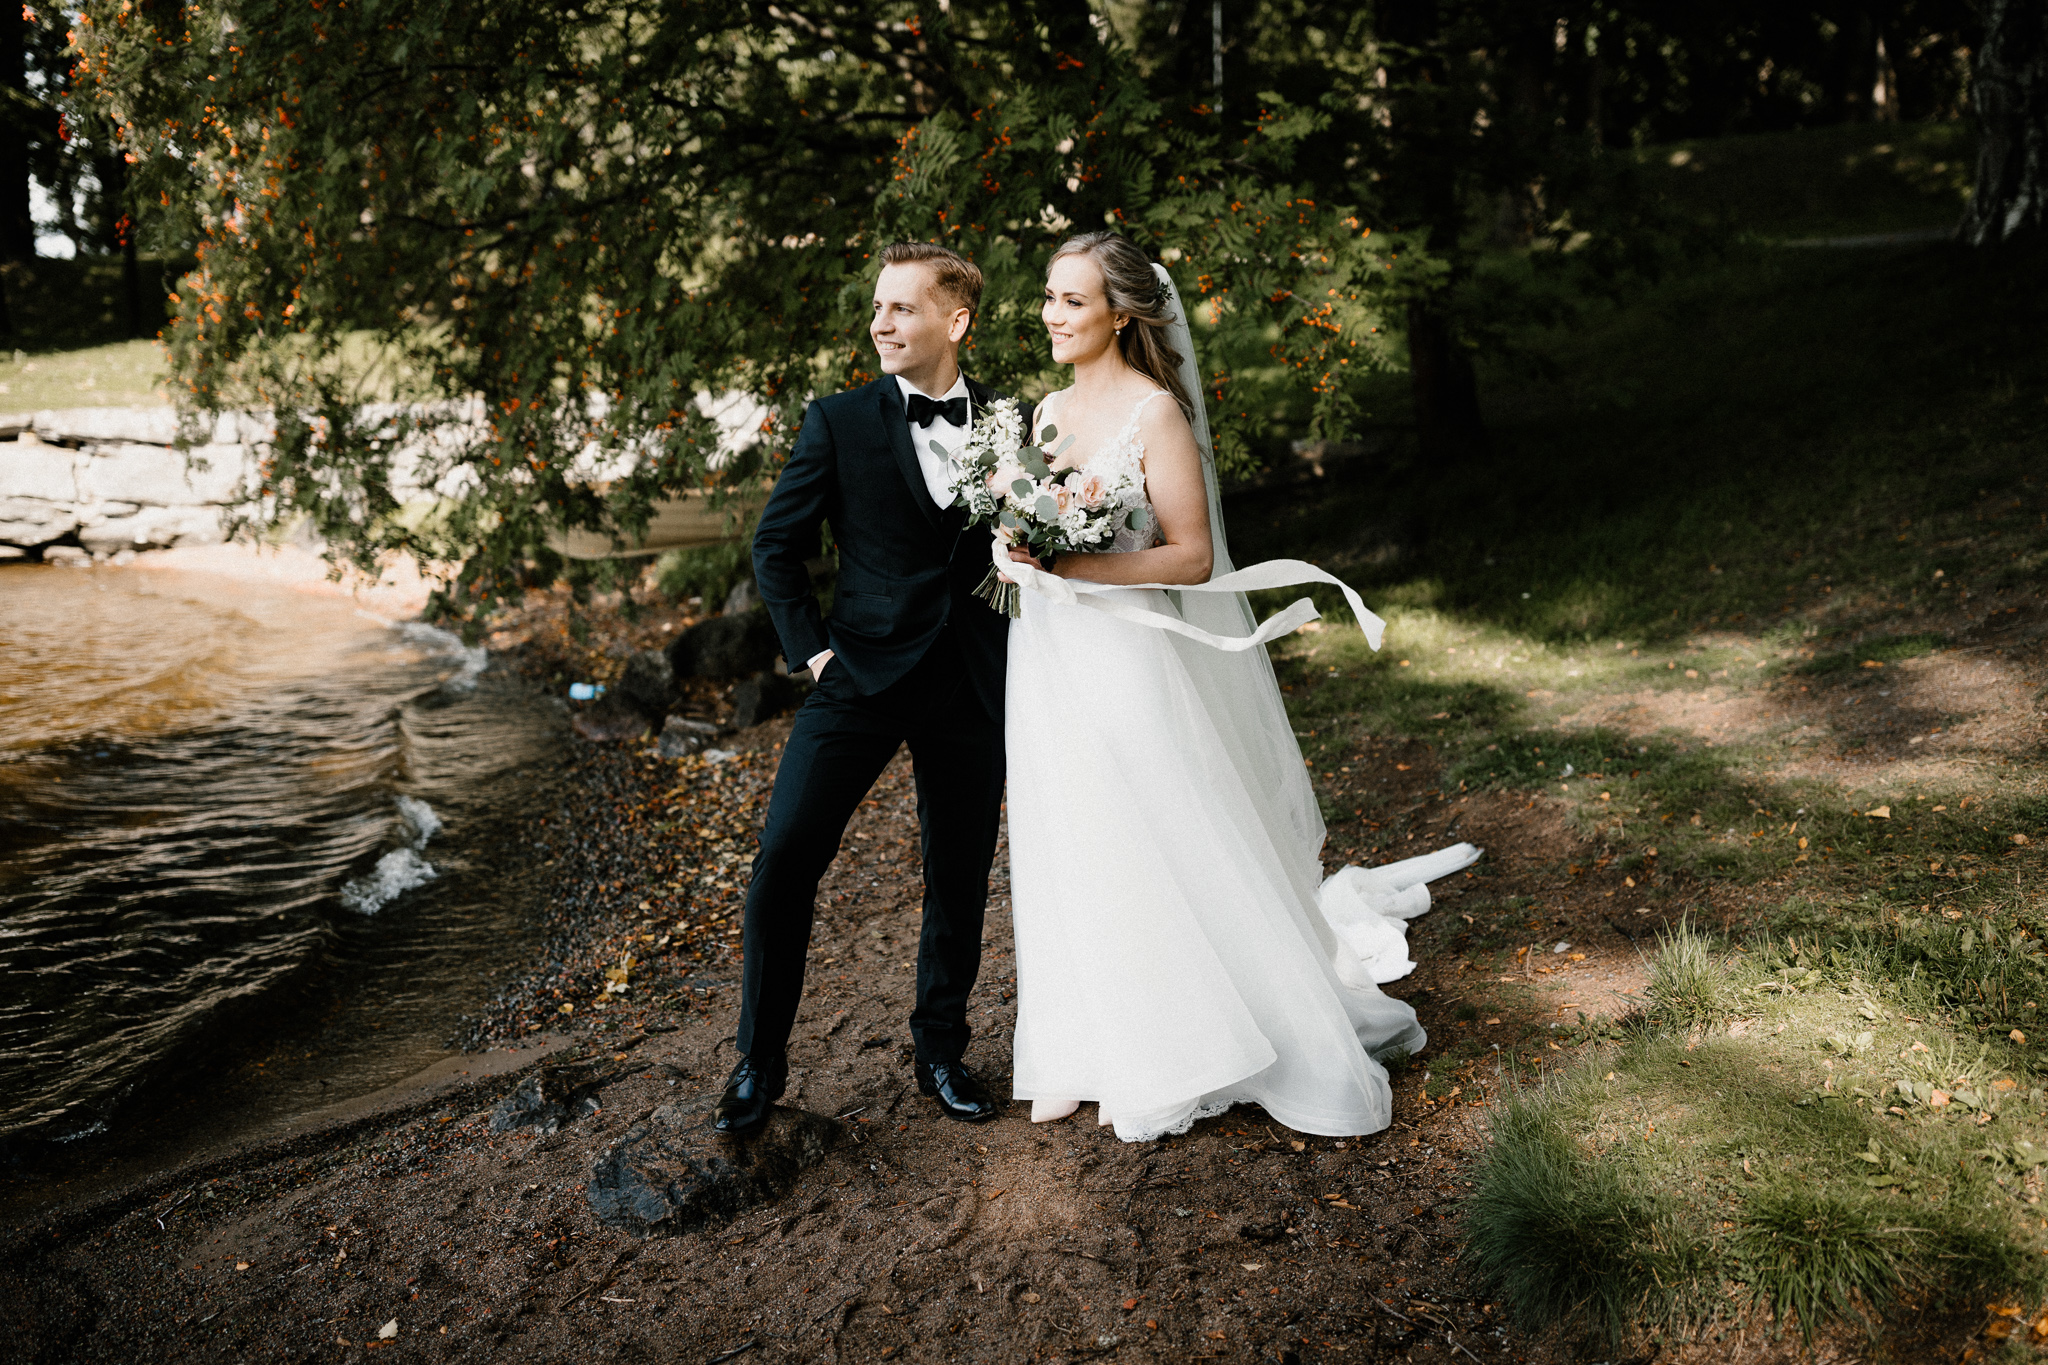 Johanna + Mikko - Tampere - Photo by Patrick Karkkolainen Wedding Photographer-32.jpg